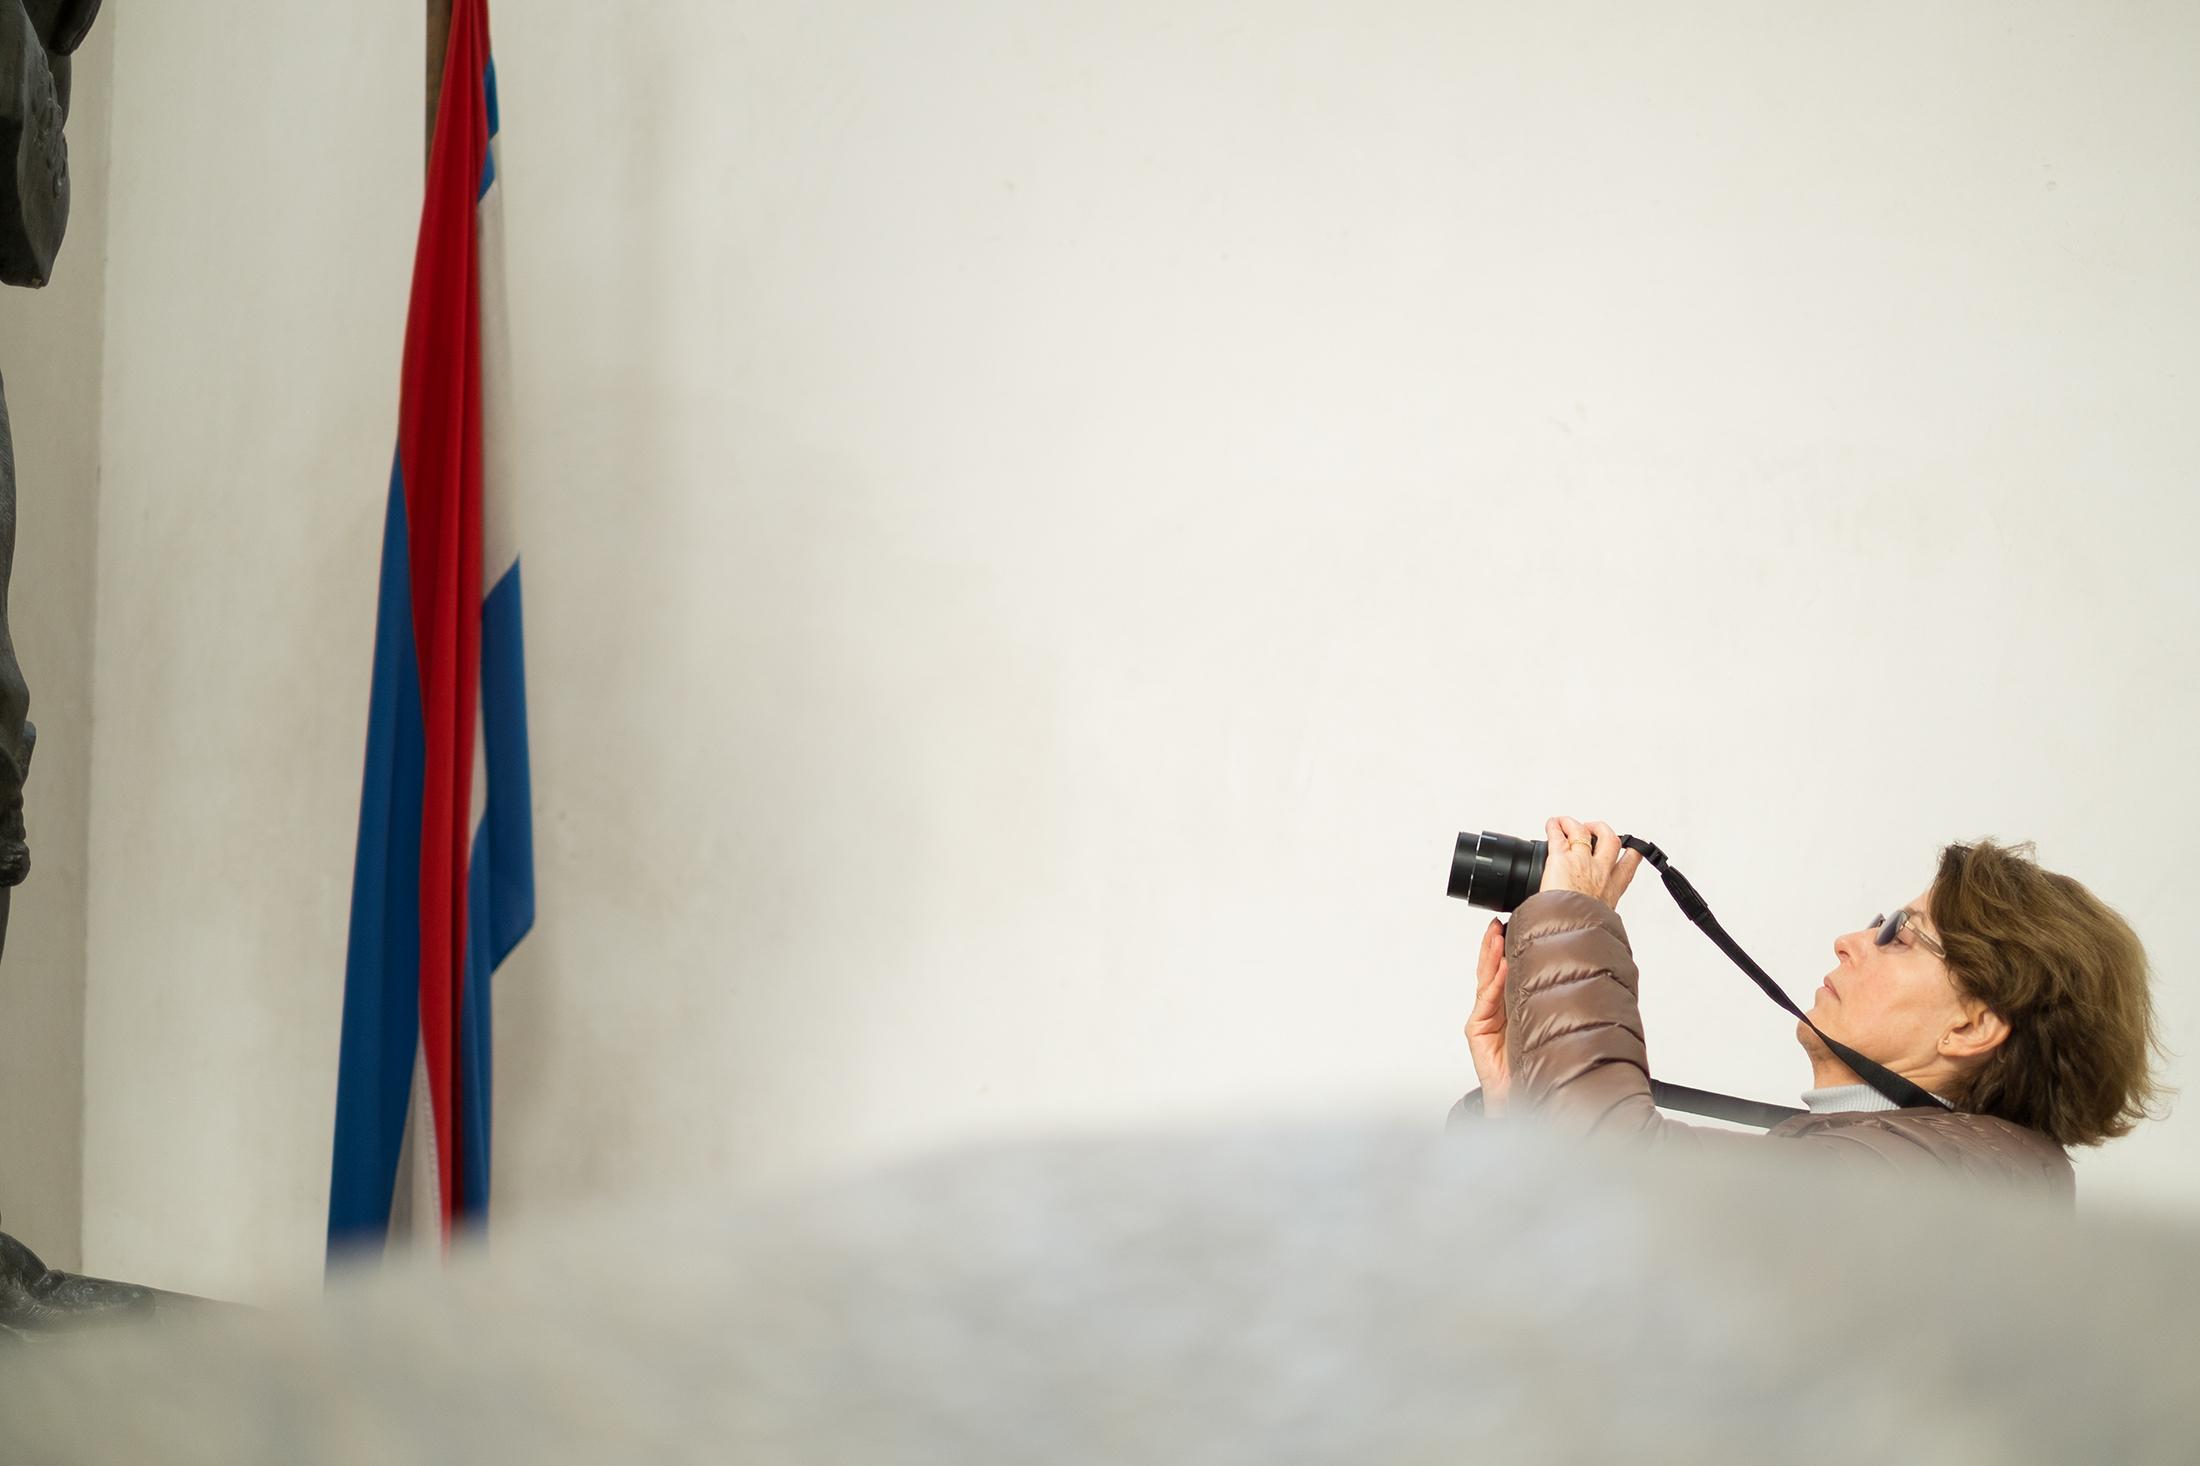 Taller de fotografia Vol. I - Docente: Nicolás Vidal / Martín Monteverde